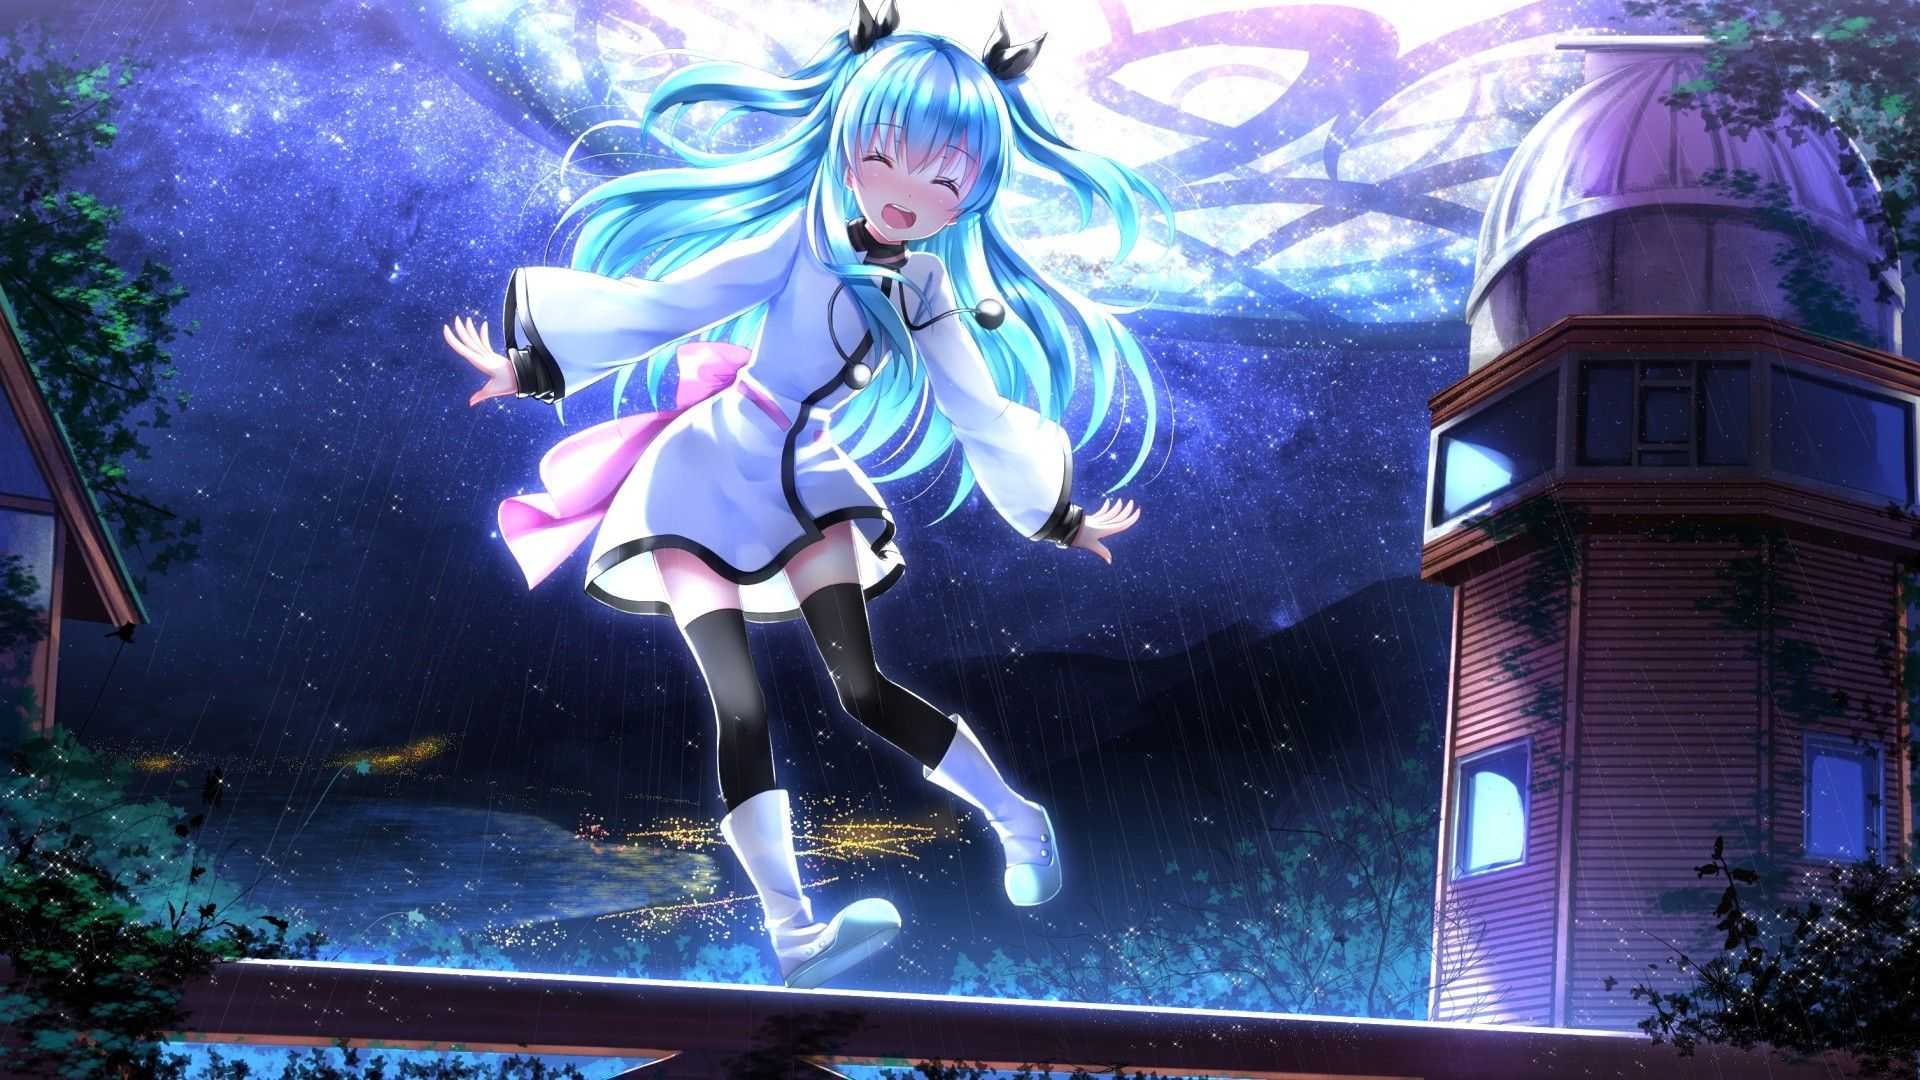 long hair, aqua hair, blue hair, anime, anime girls